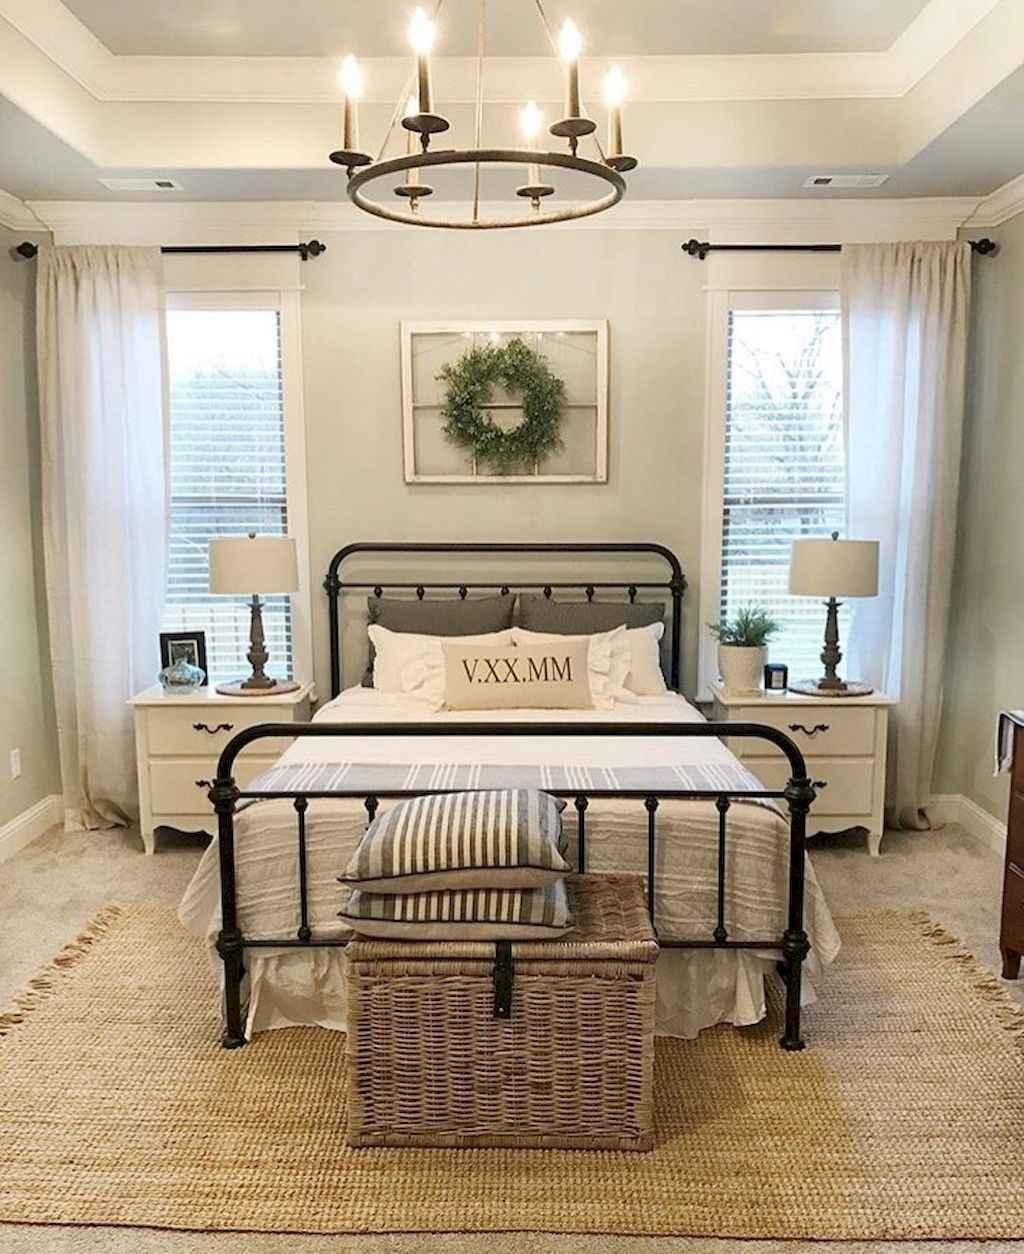 Incredible master bedroom ideas (2)